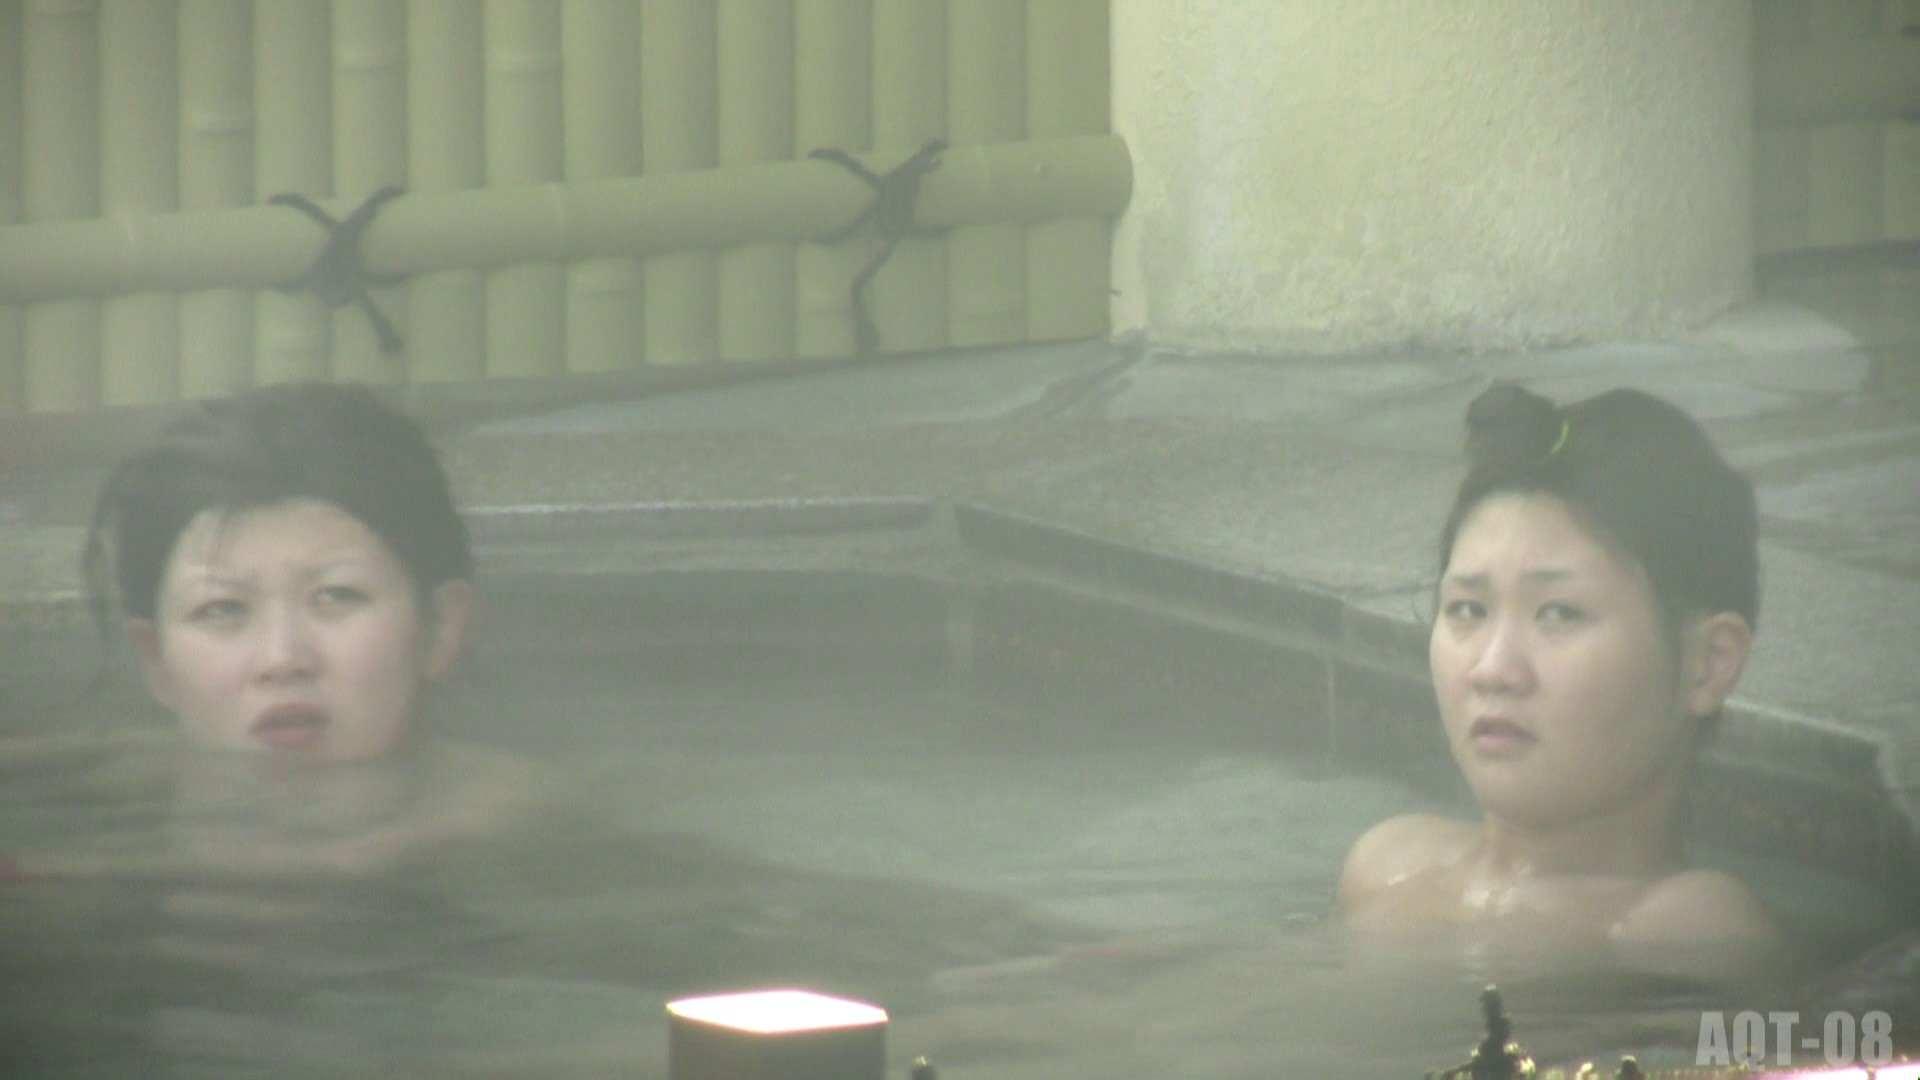 Aquaな露天風呂Vol.777 盗撮特撮  10pic 6